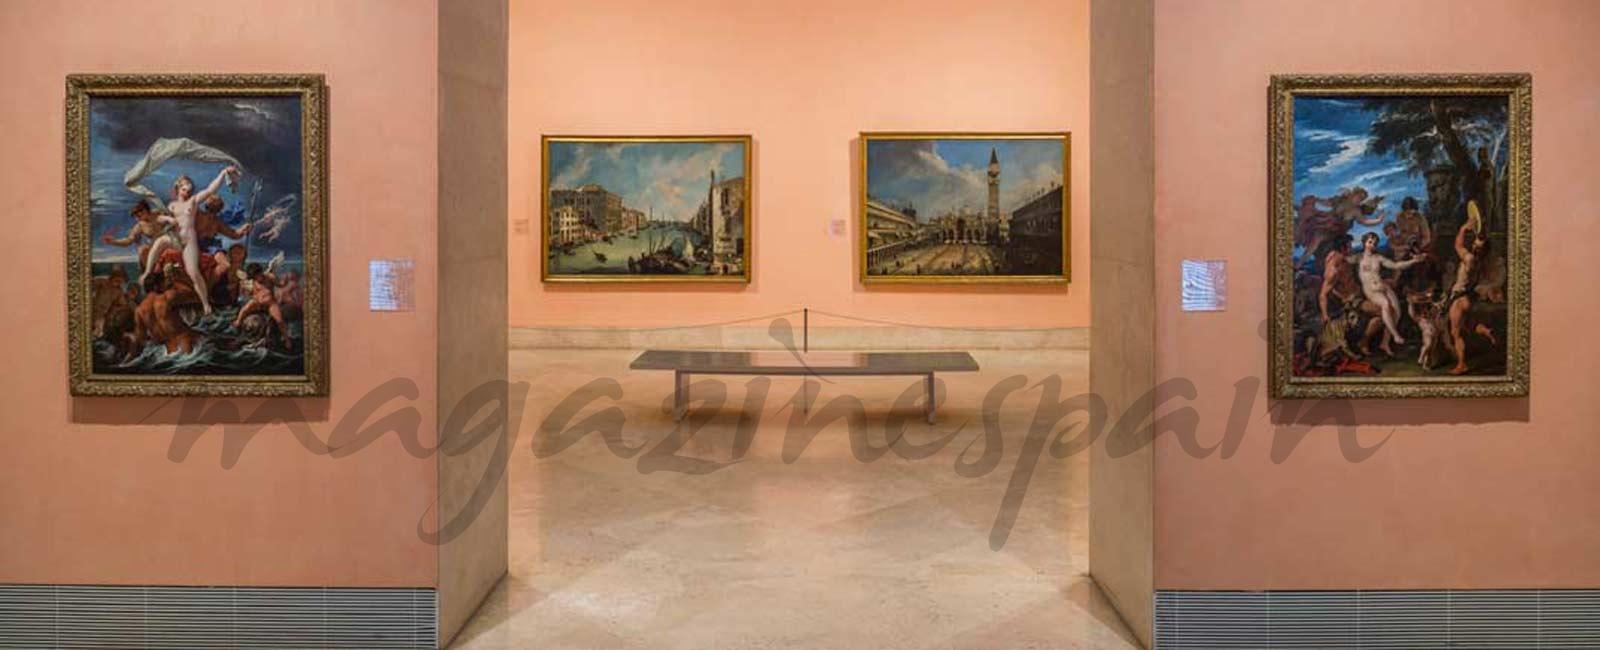 El Museo Nacional Thyssen-Bornemisza celebra su 25 aniversario